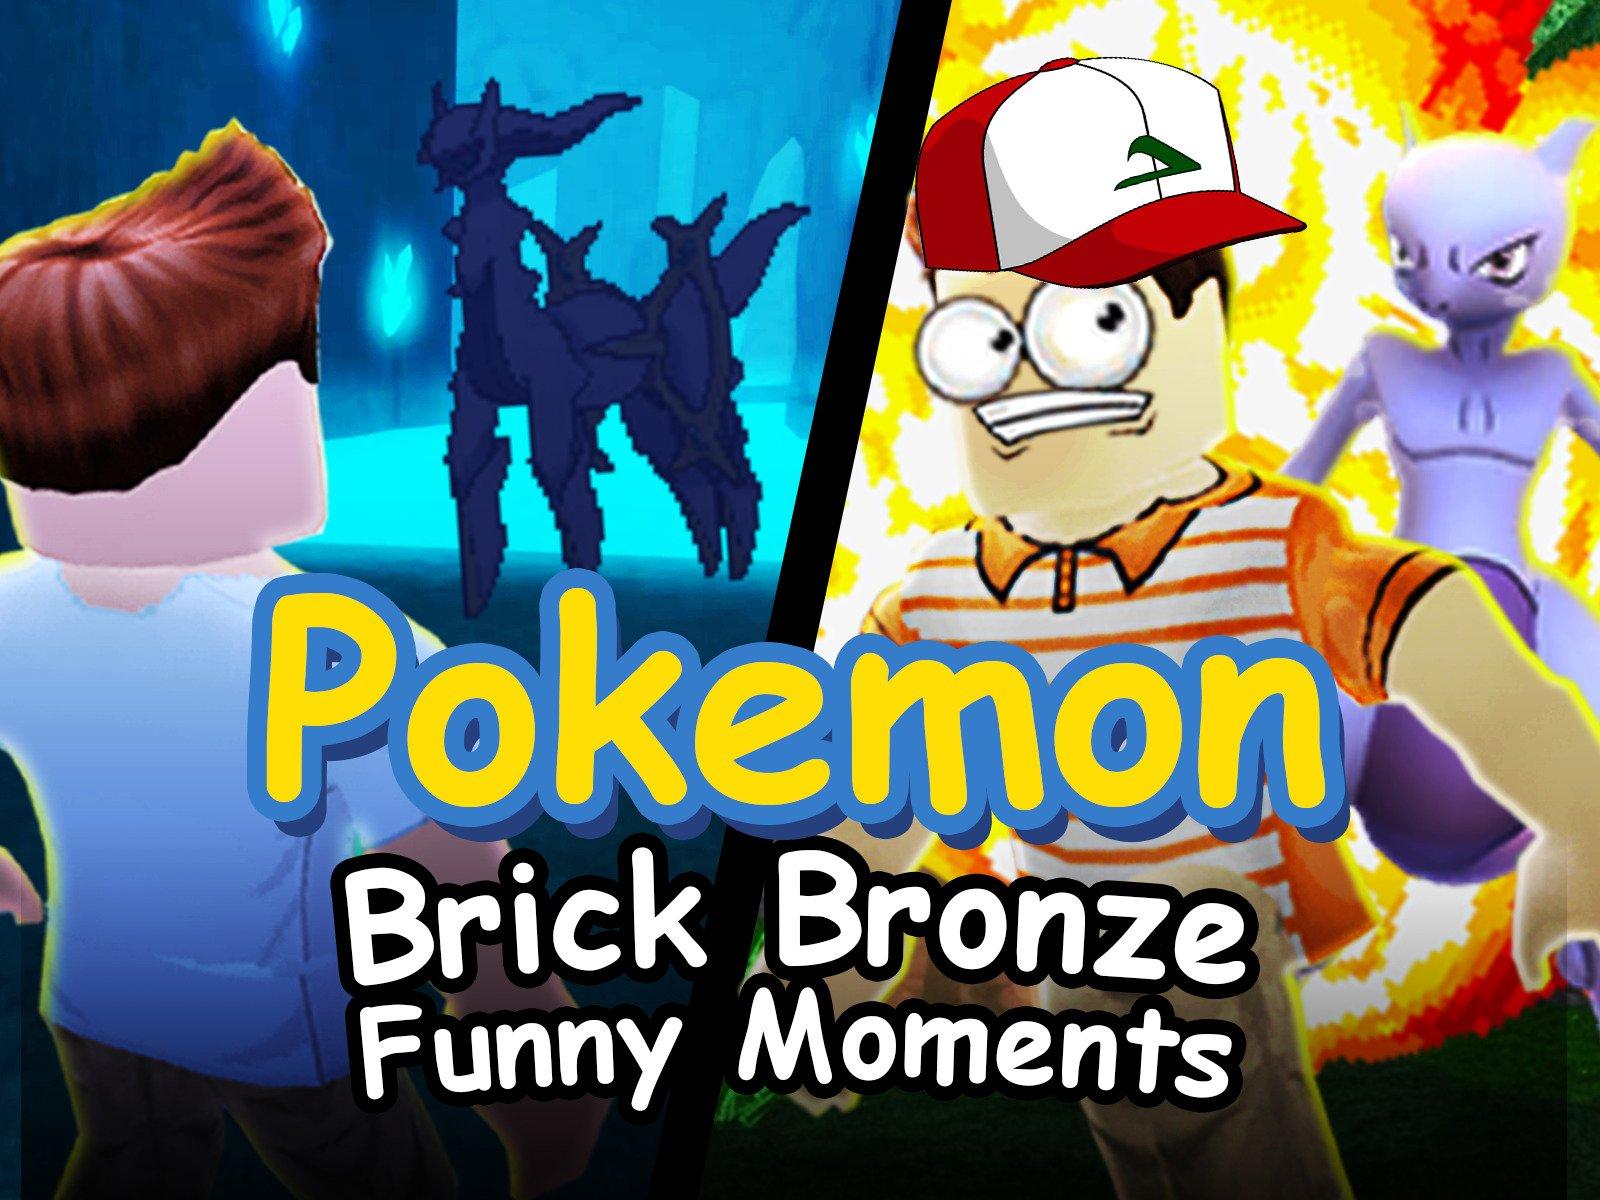 Roblox Pokemon Brick Bronze Using My 2nd Party Team And - Watch Clip Roblox Pokemon Brick Bronze Funny Moments